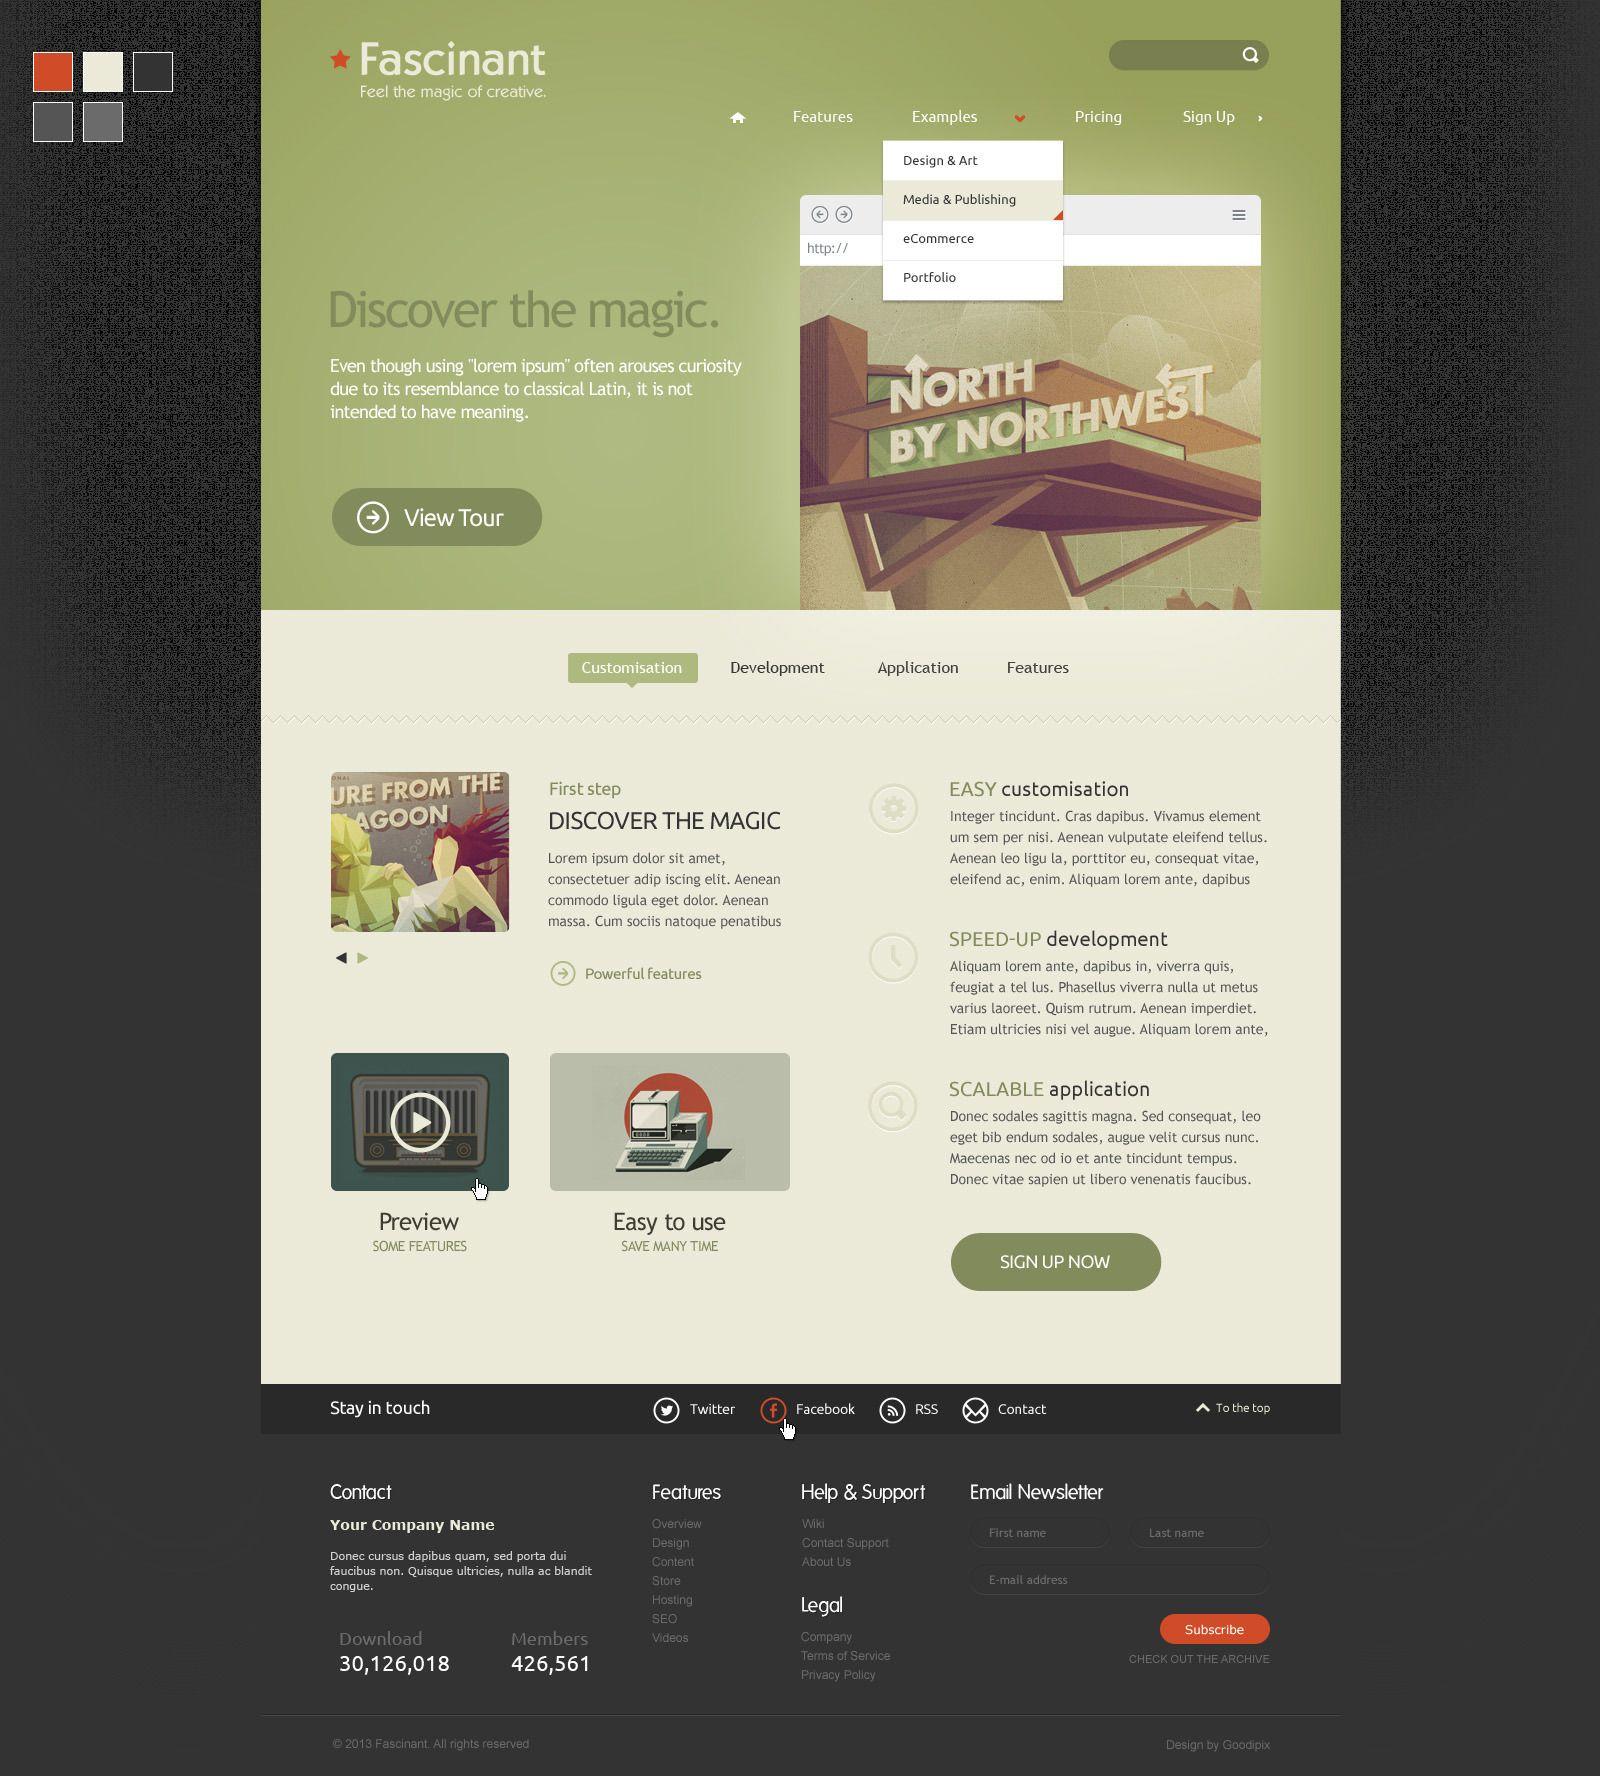 PSD Template - Fascinant  #wordpress #premium #theme #flatdesign #webdesign #design #graphicdesign #template #psd #photoshop #retro